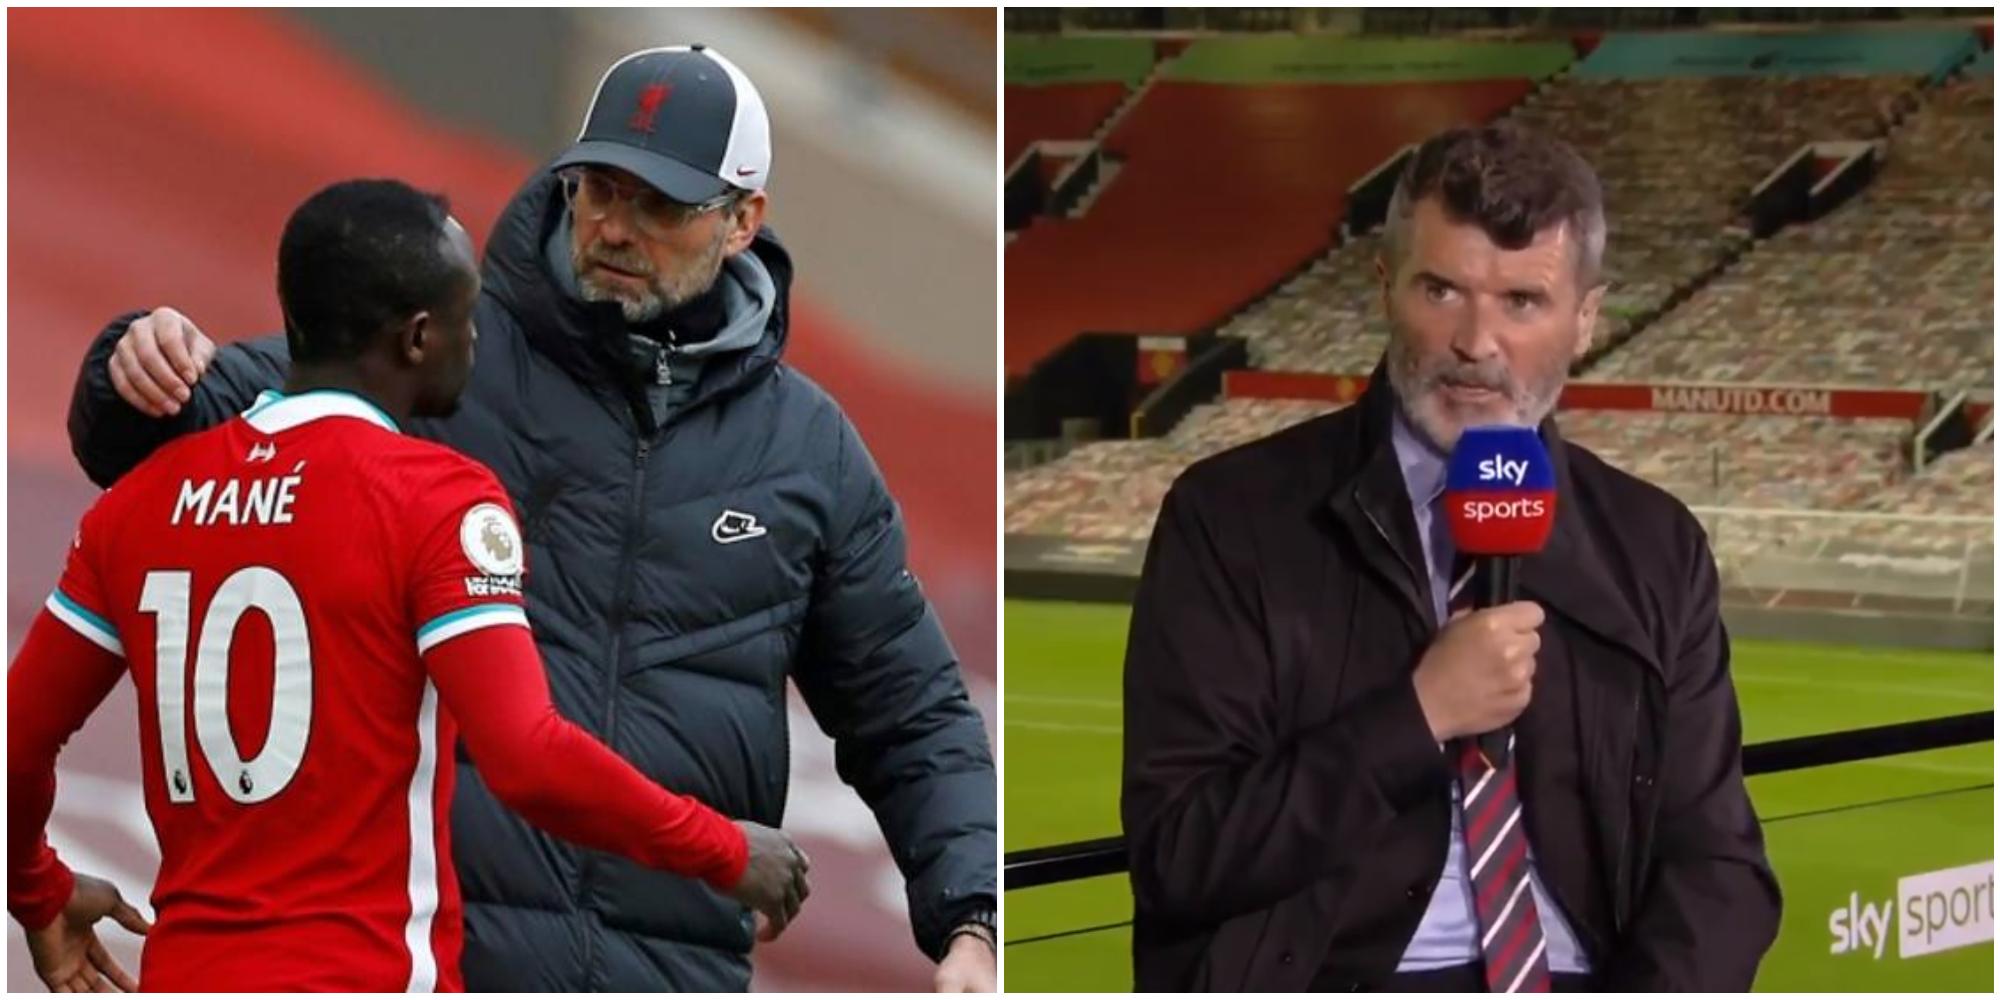 Roy Keane launches bizarre attack on Jurgen Klopp over handling of Sadio Mane incident